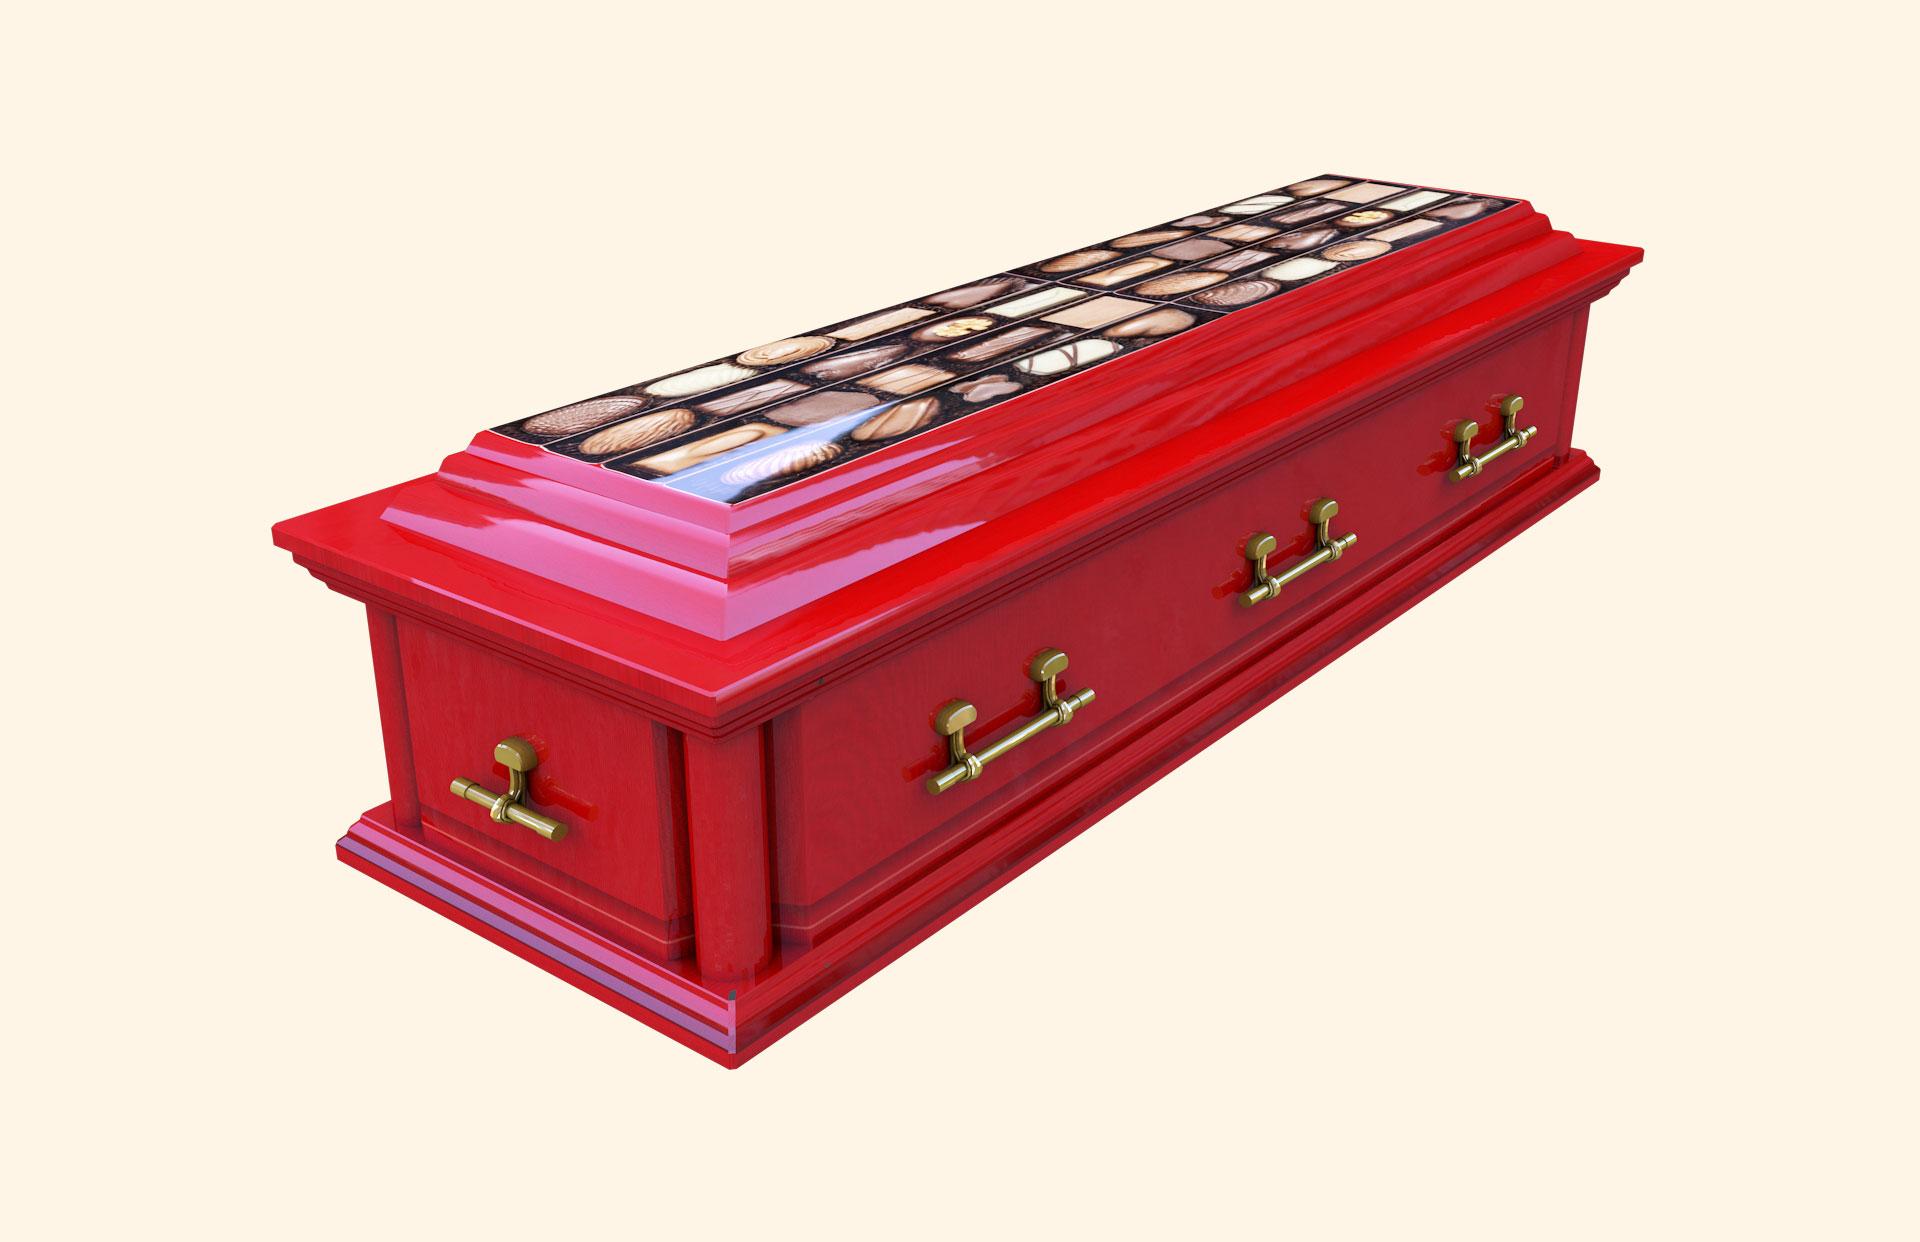 Chocoholic C Huthwaite Wooden American Casket